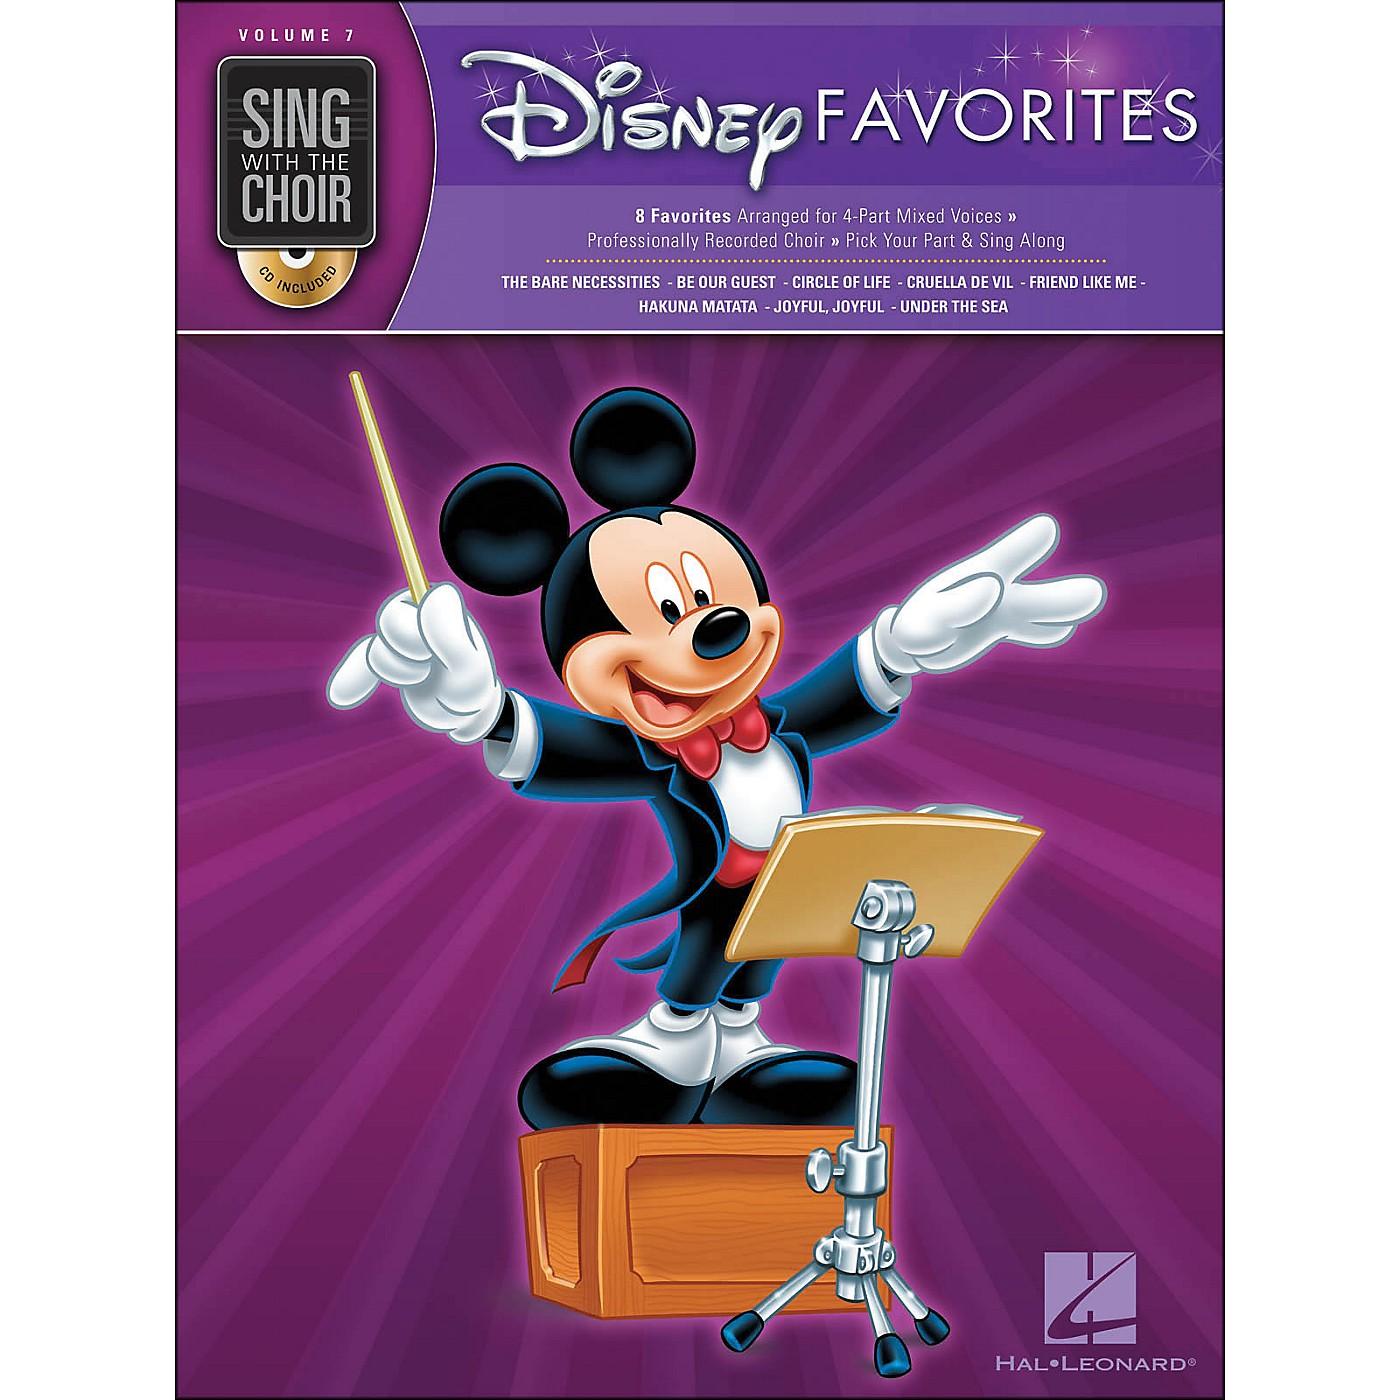 Hal Leonard Disney Favorites - Sing with The Choir Series Vol. 7 Book/CD thumbnail